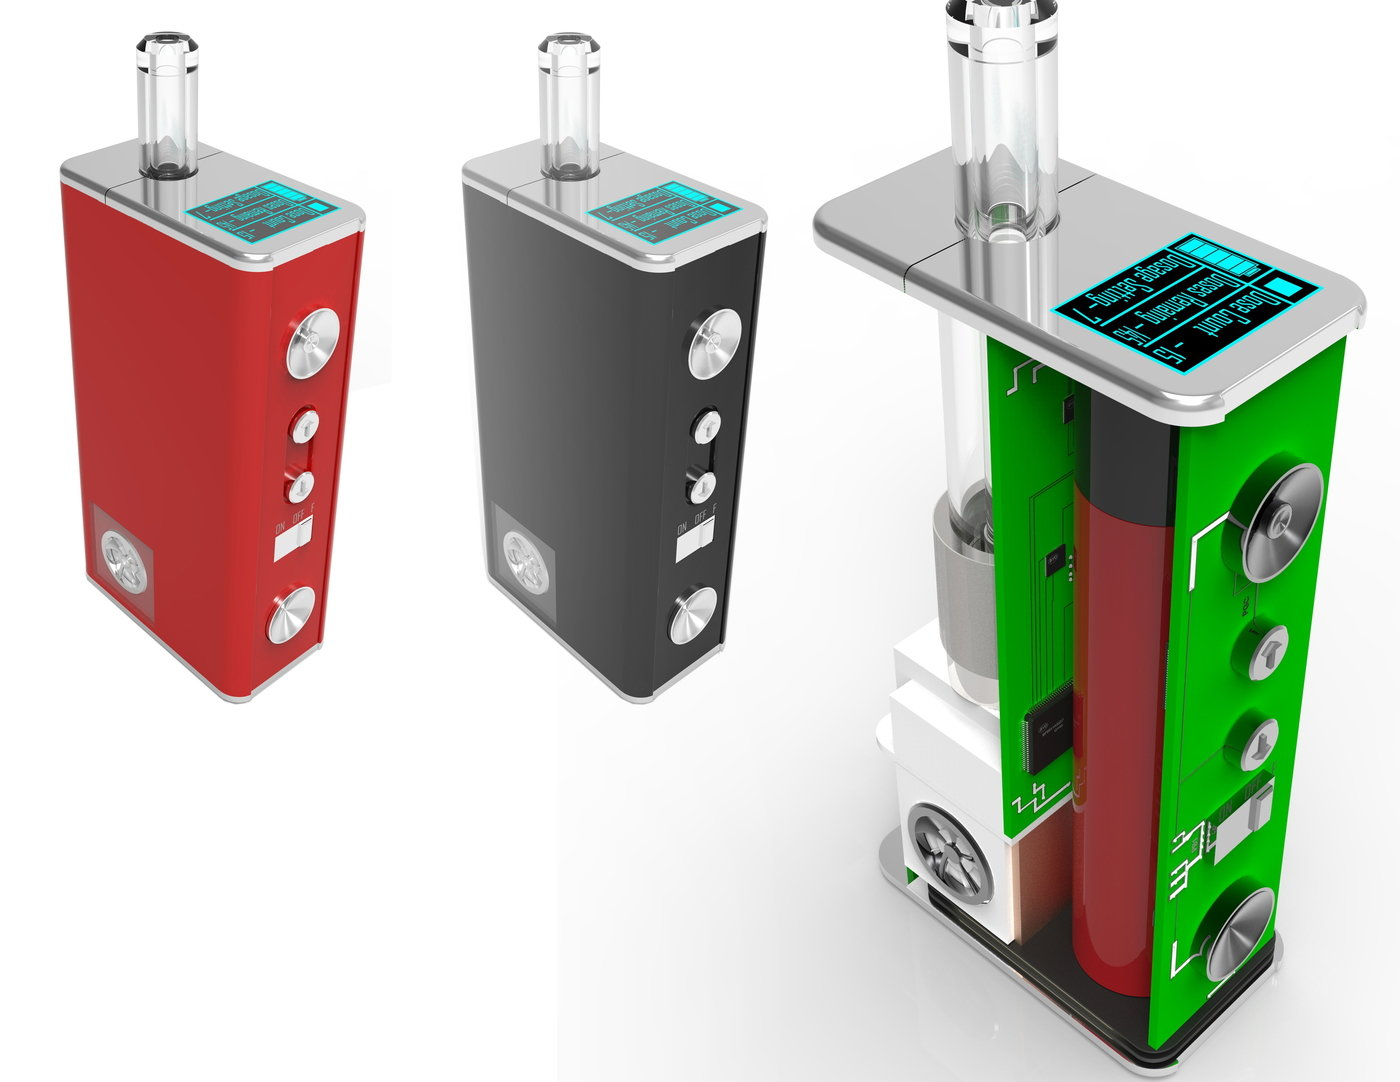 E-cigs, Vape Pen Design, etc   by Gebre Mesquitta at